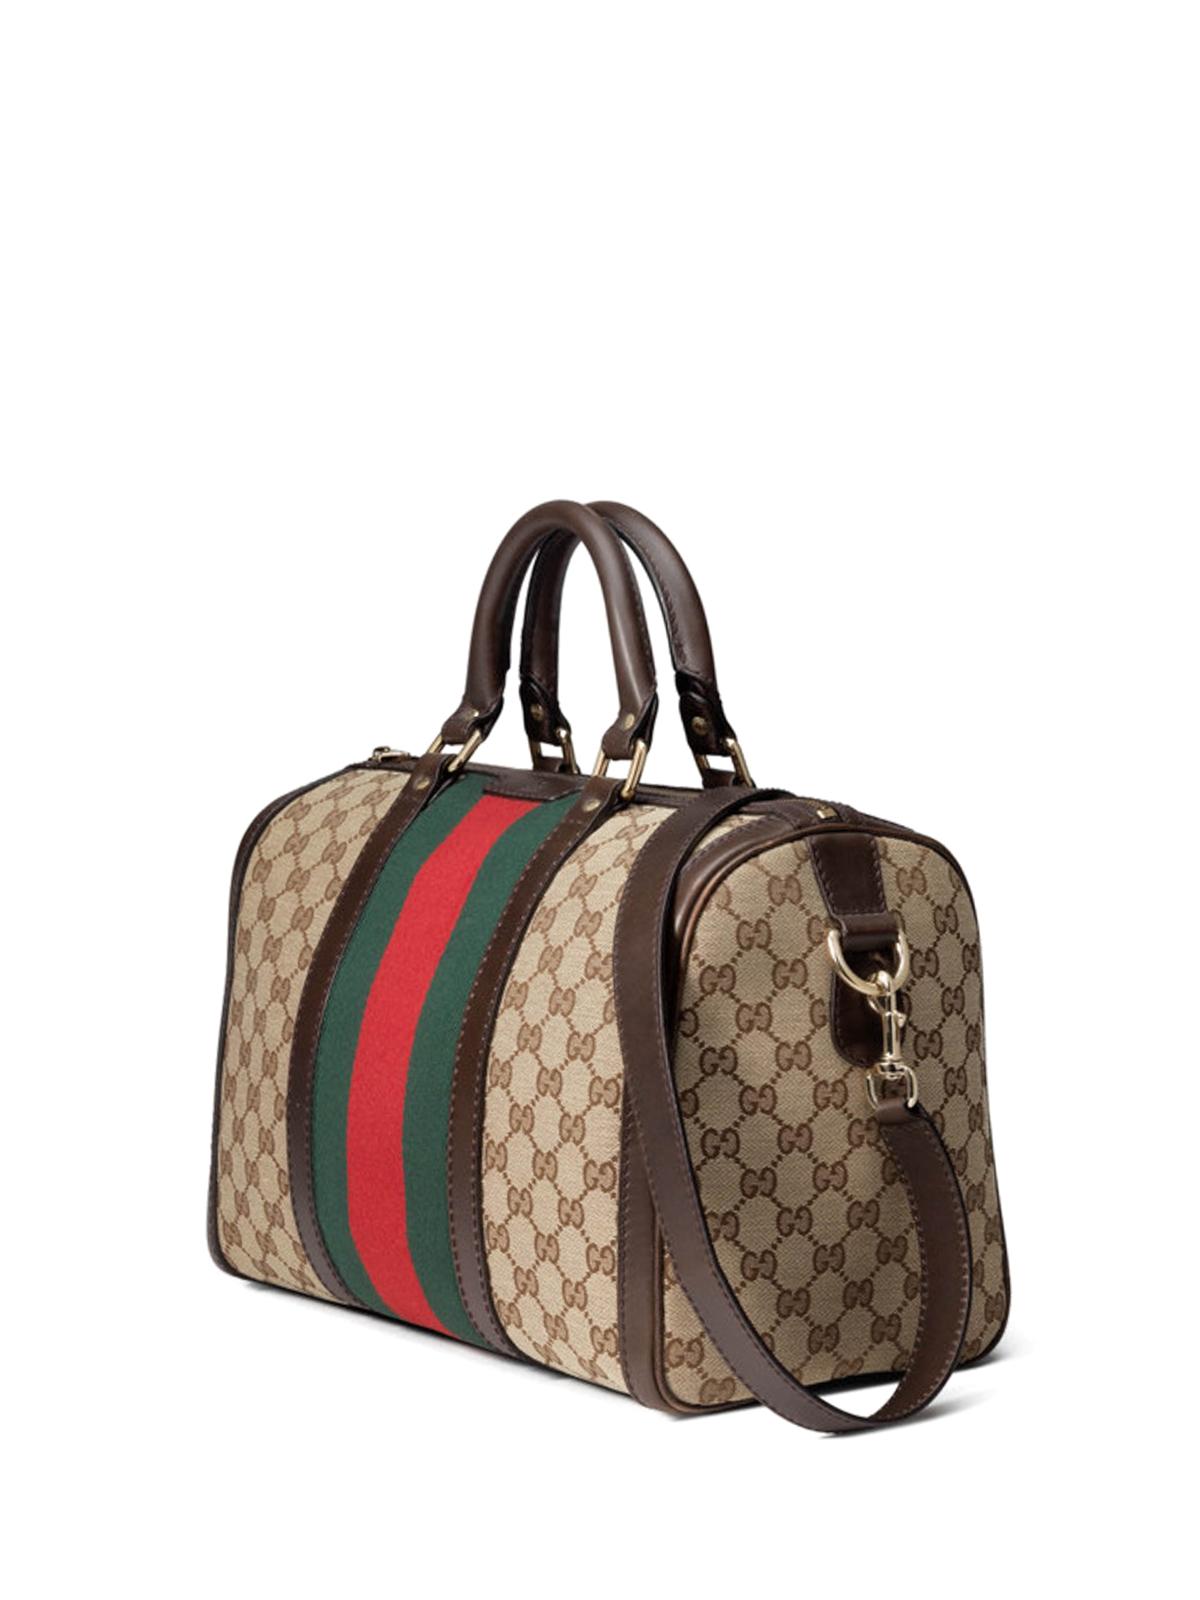 Vintage Web Original GG Boston Bag By Gucci - Bowling Bags | IKRIX